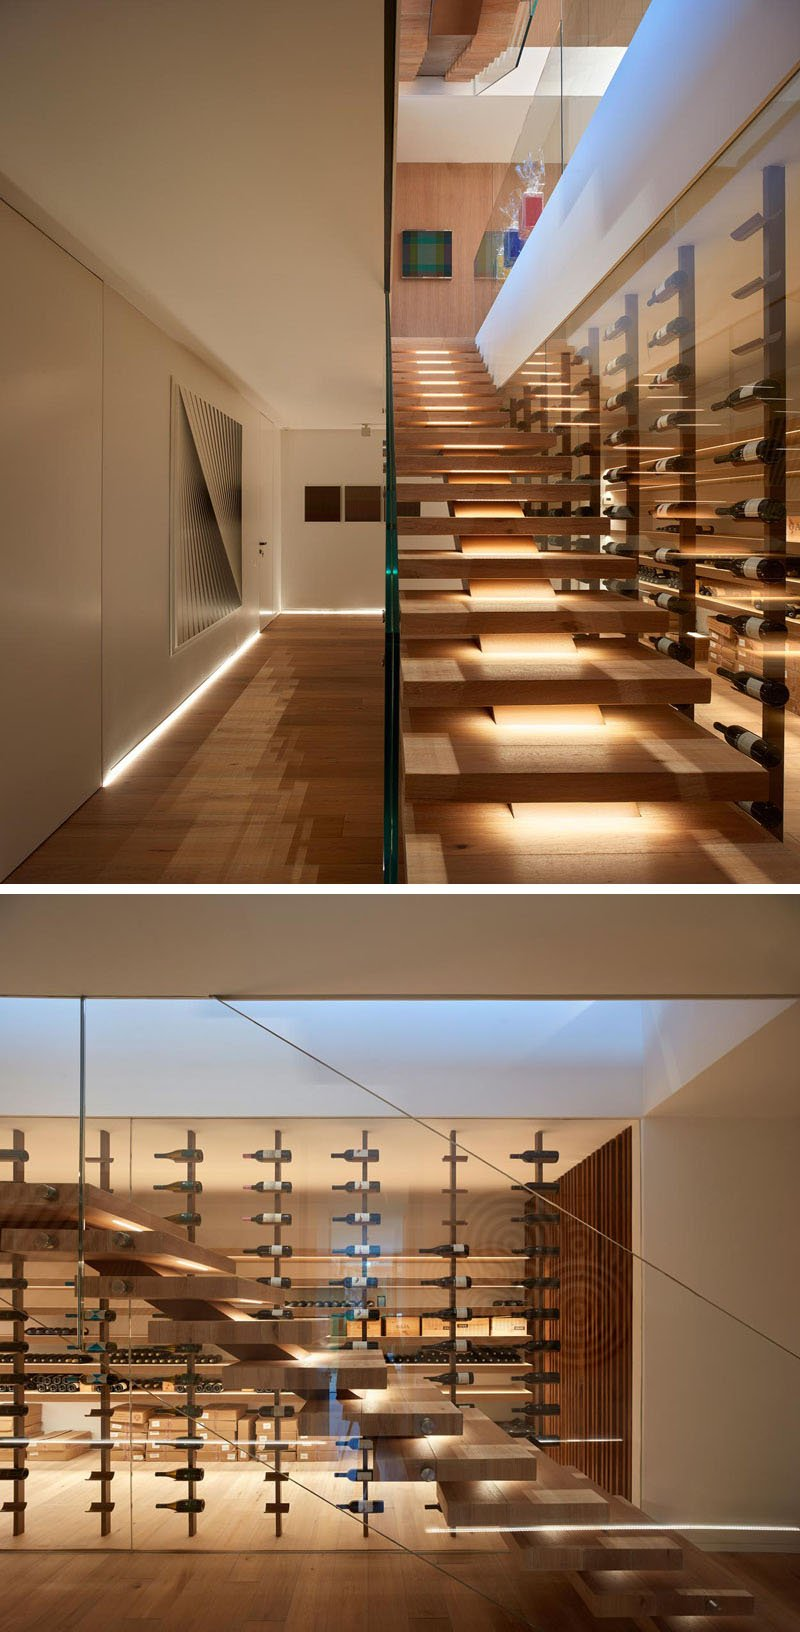 modern-wood-stairs-wine-cellar-060219-1121-07